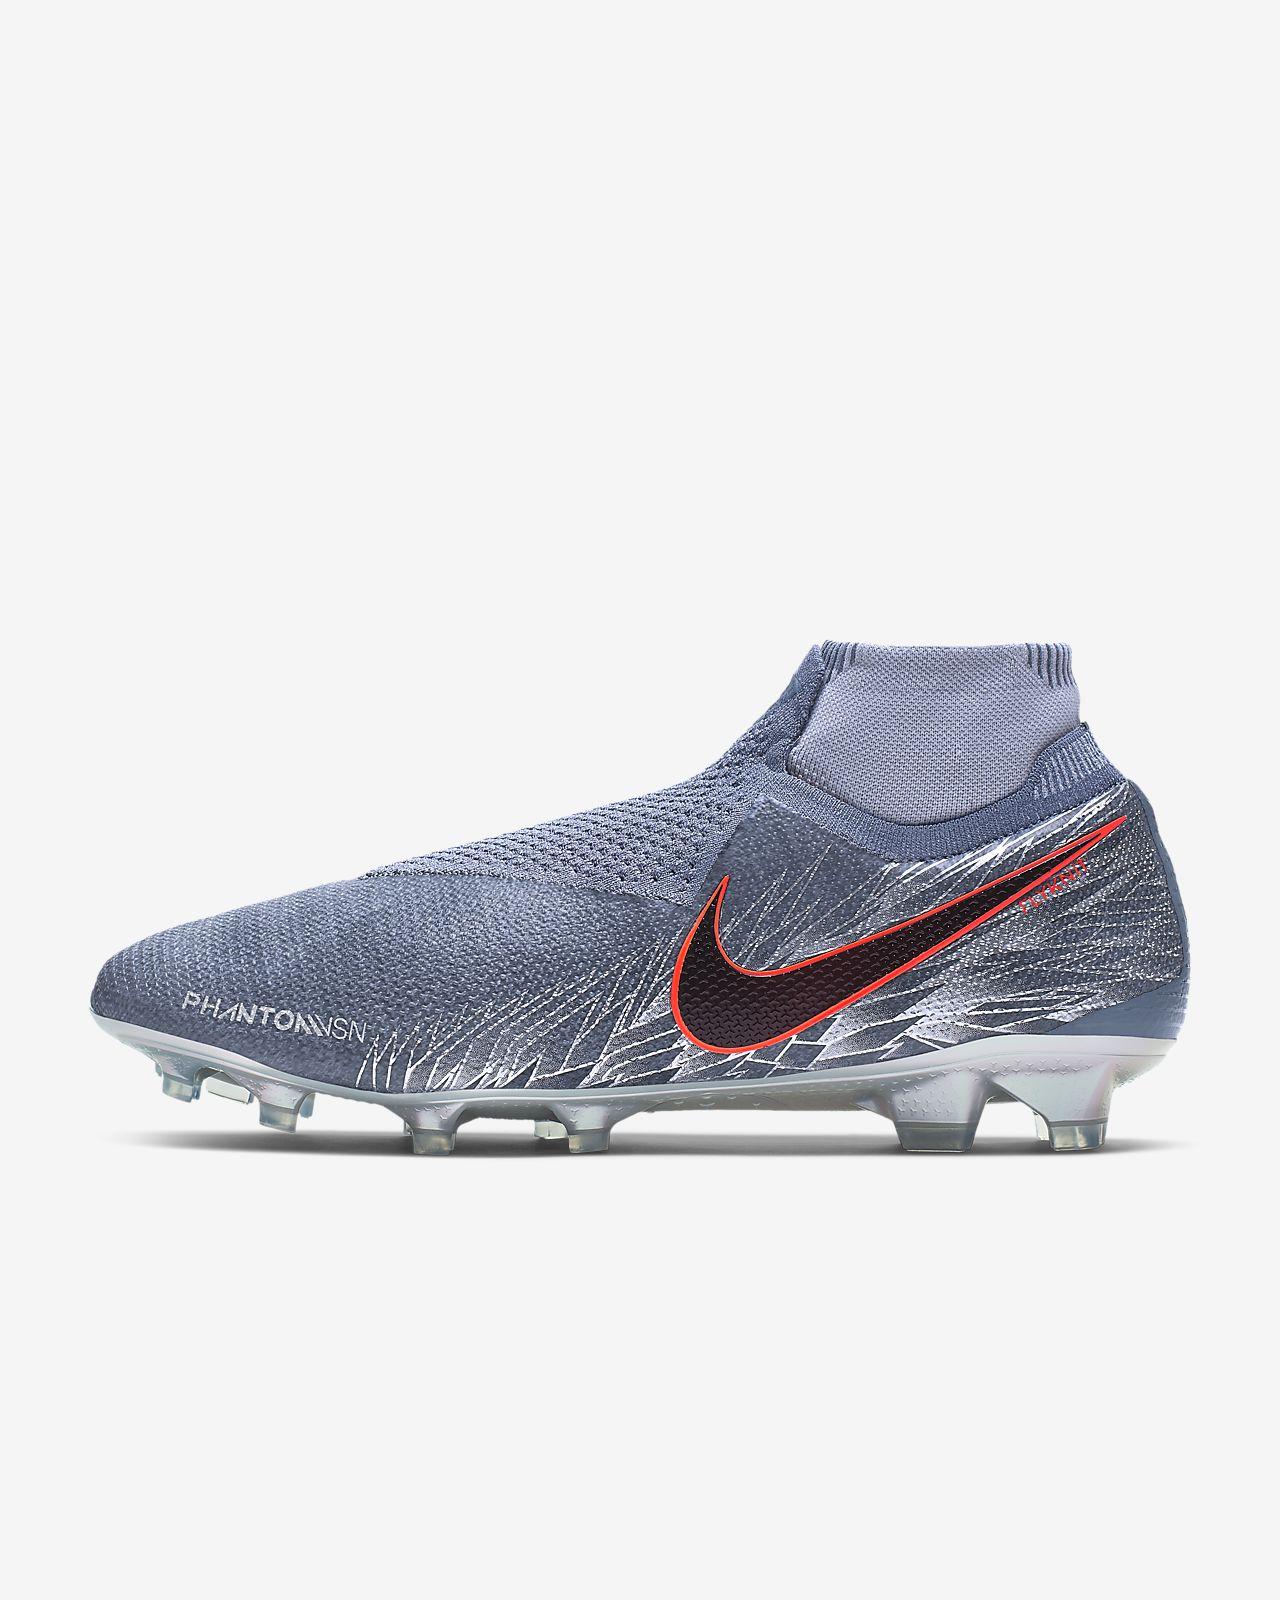 Nike Phantom Vision Elite Dynamic Fit FG Botes de futbol per a terreny ferm